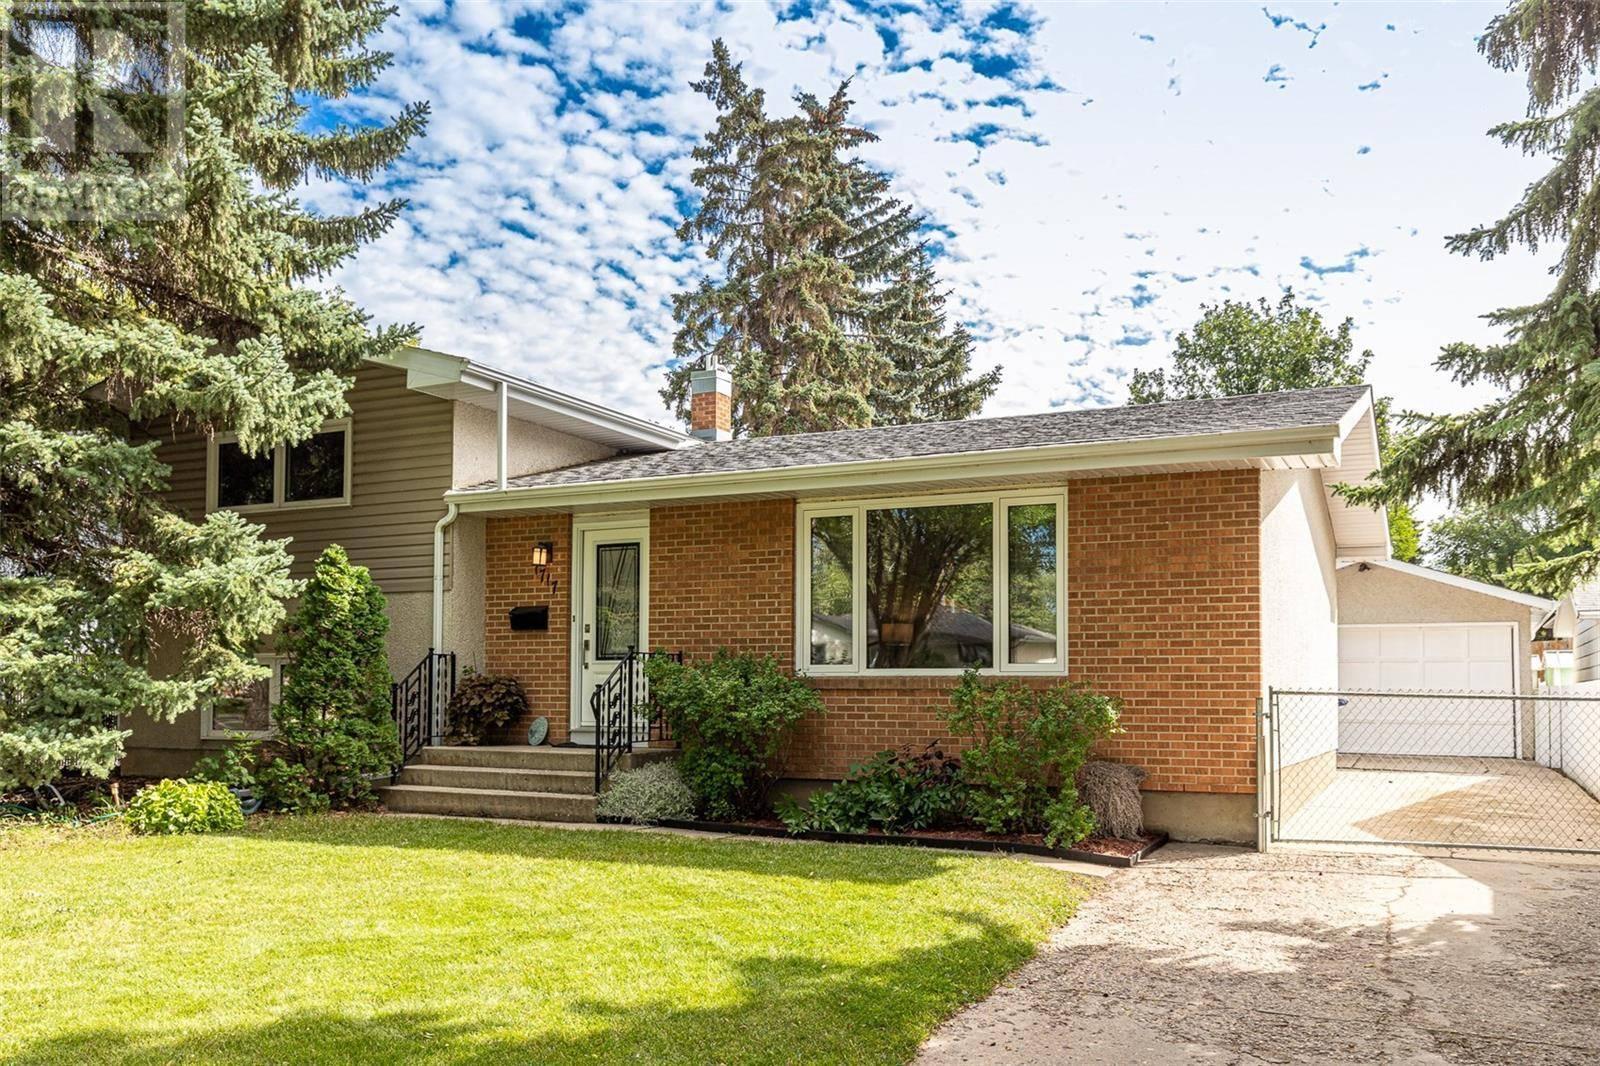 House for sale at 1717 Arlington Ave Saskatoon Saskatchewan - MLS: SK783457